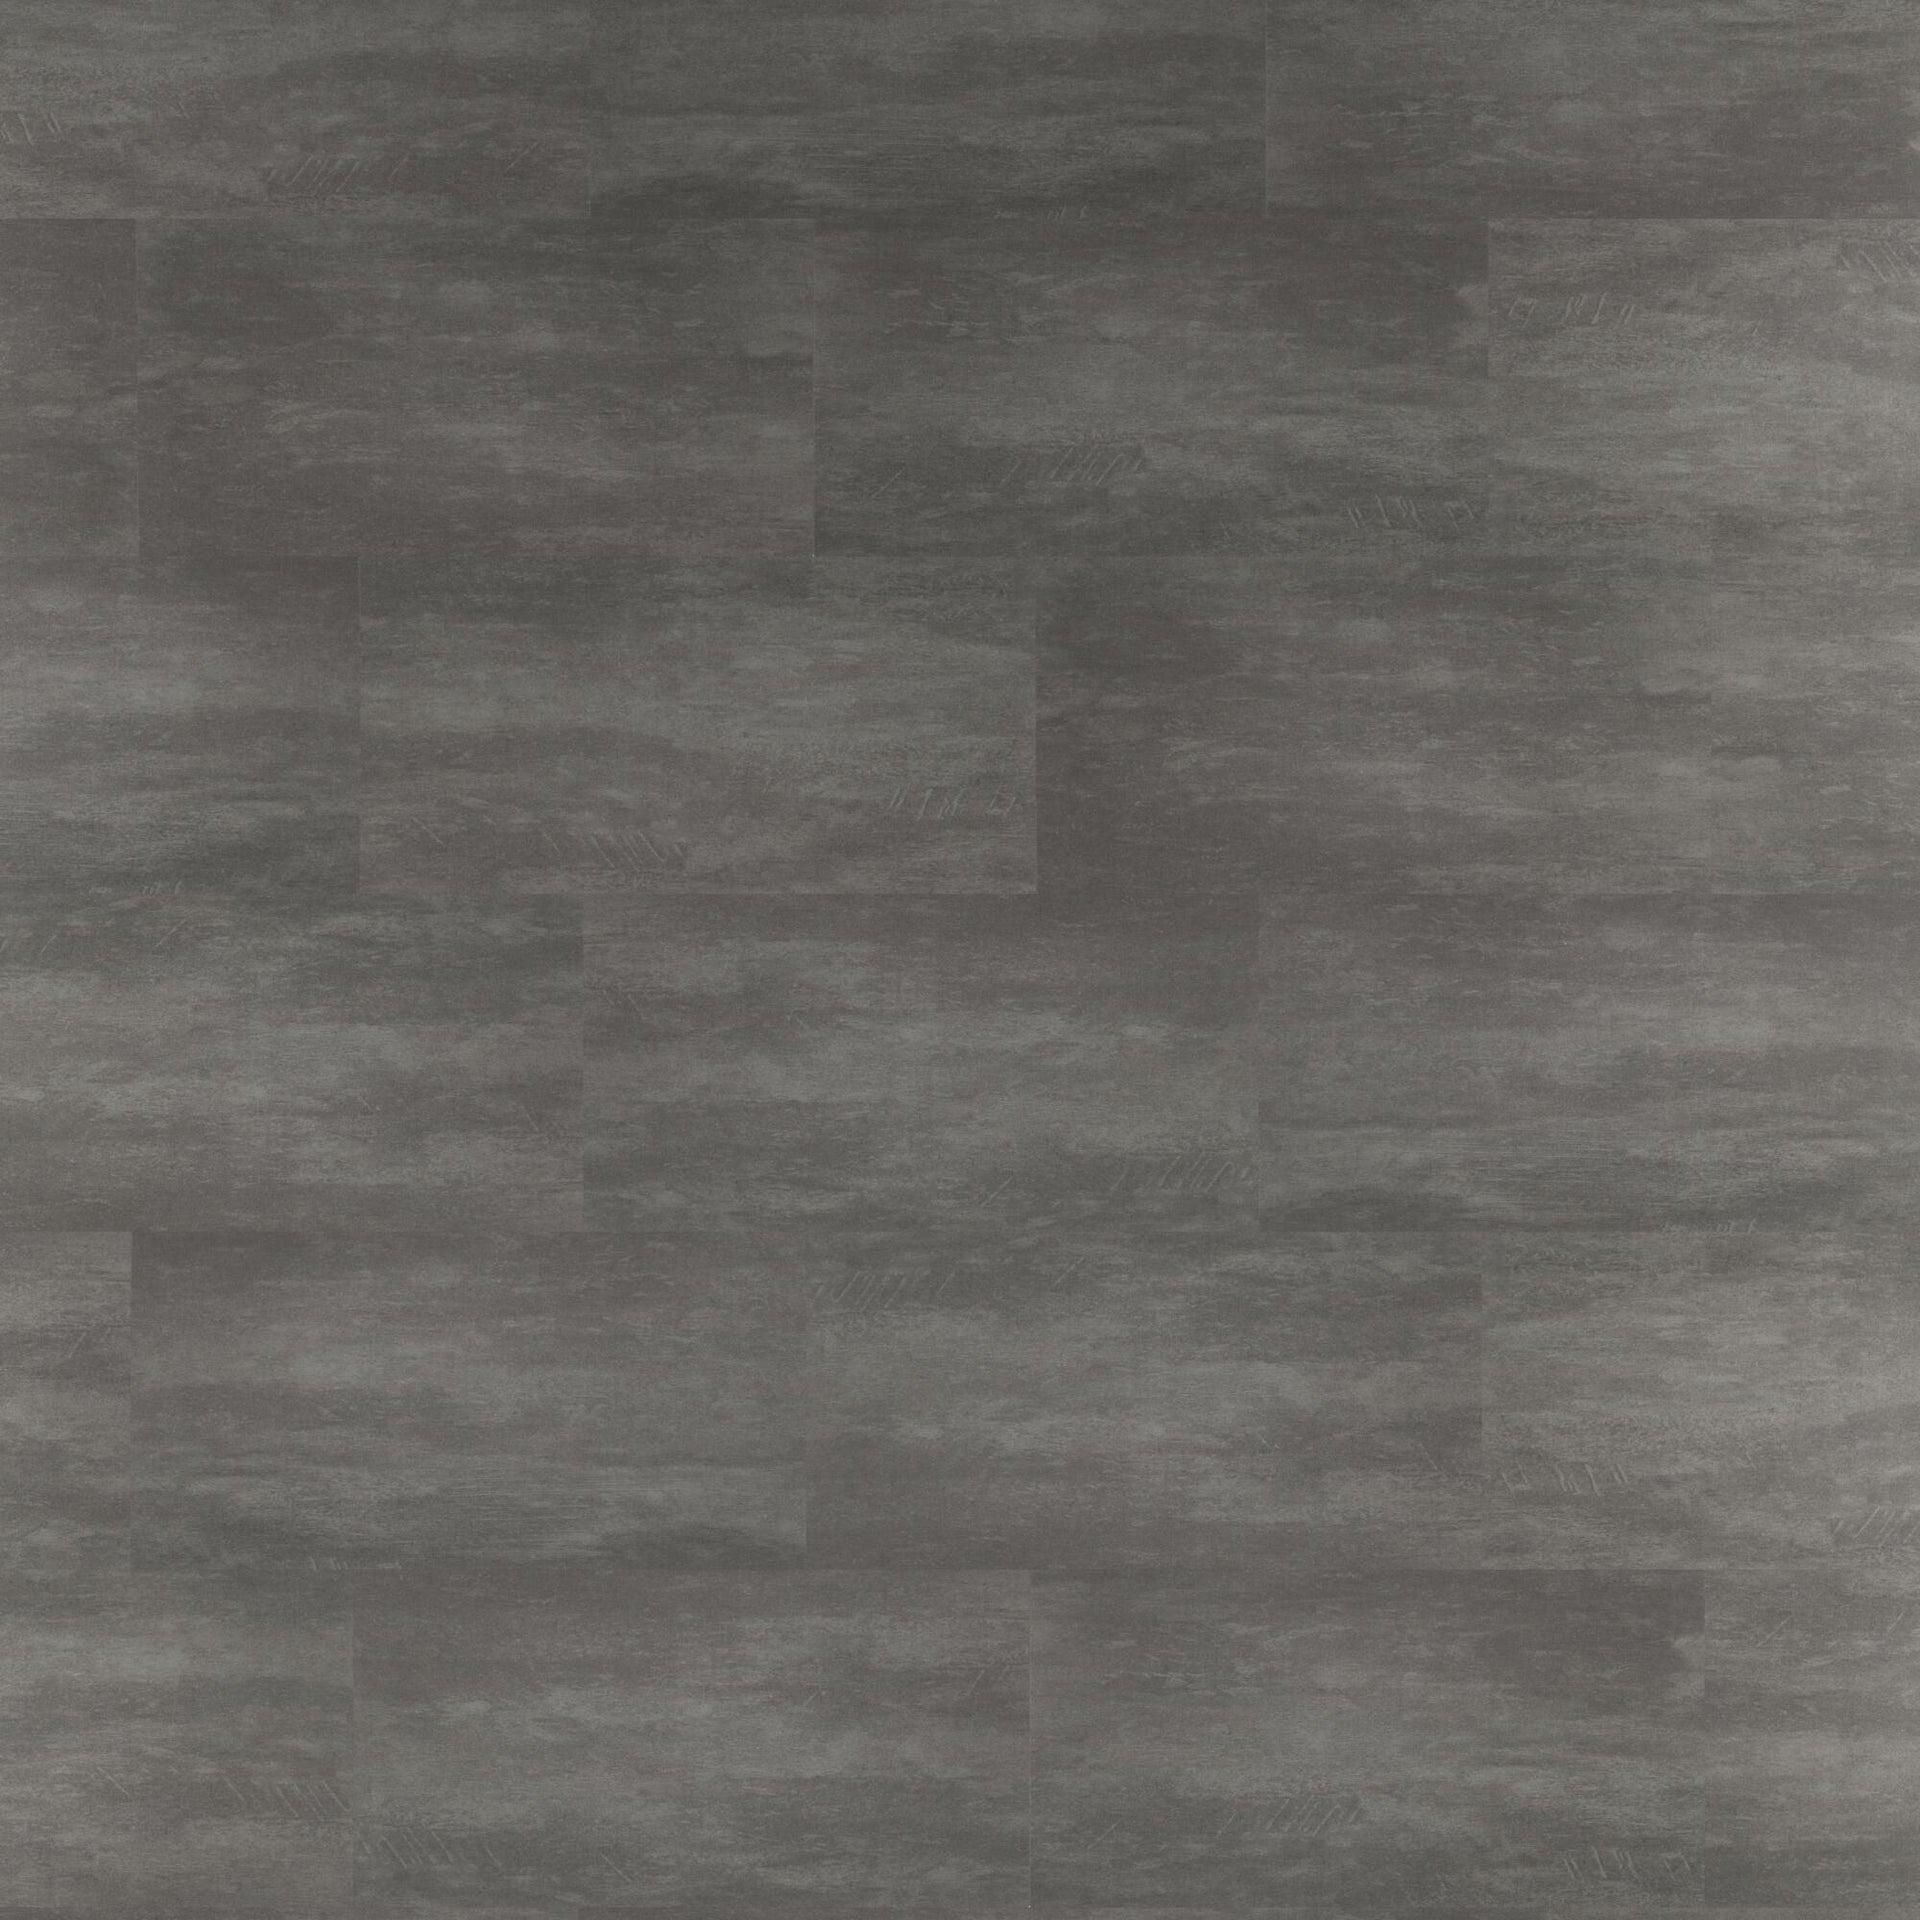 Pavimento PVC incastro Tolu Sp 4 mm grigio / argento - 10